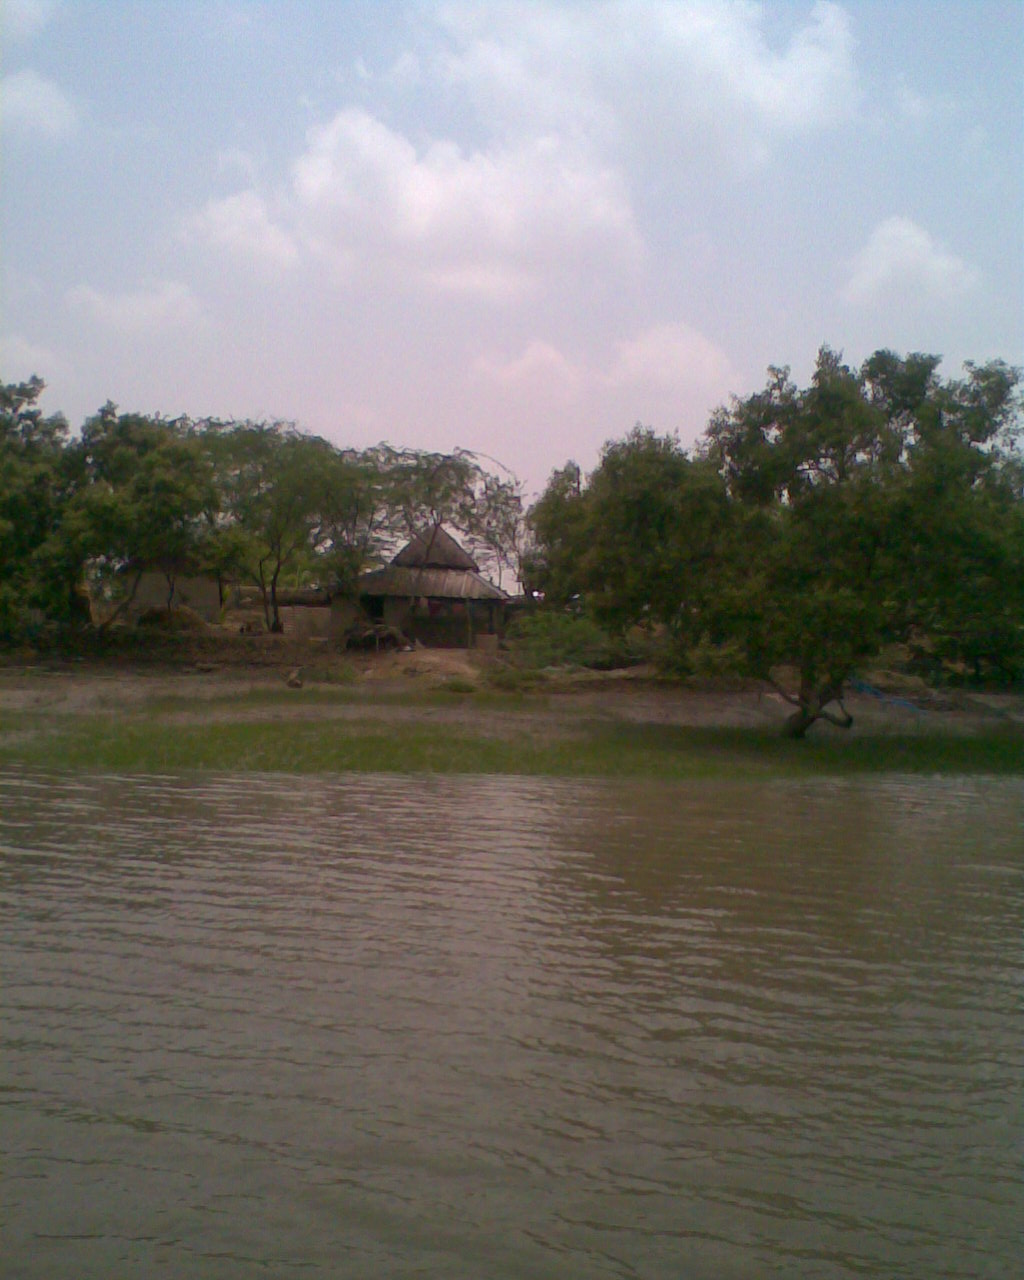 Fringe area in the Sunderbans